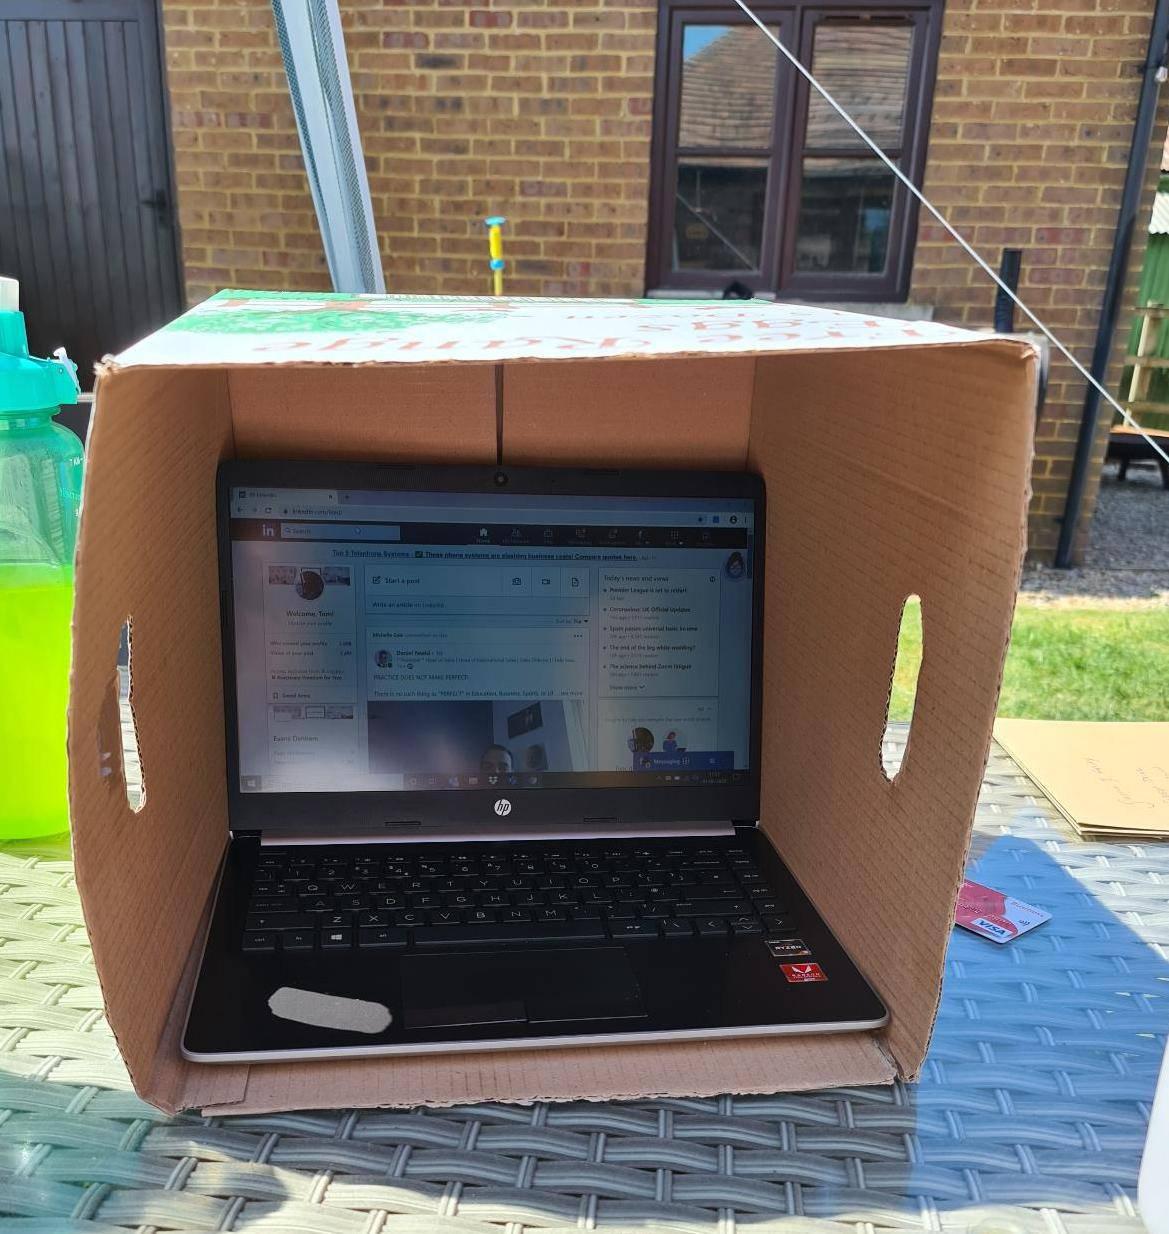 Novo 'čudo tehnologije': Otkrio trik kako da sunce ne zabljesne ekran laptopa dok radite vani